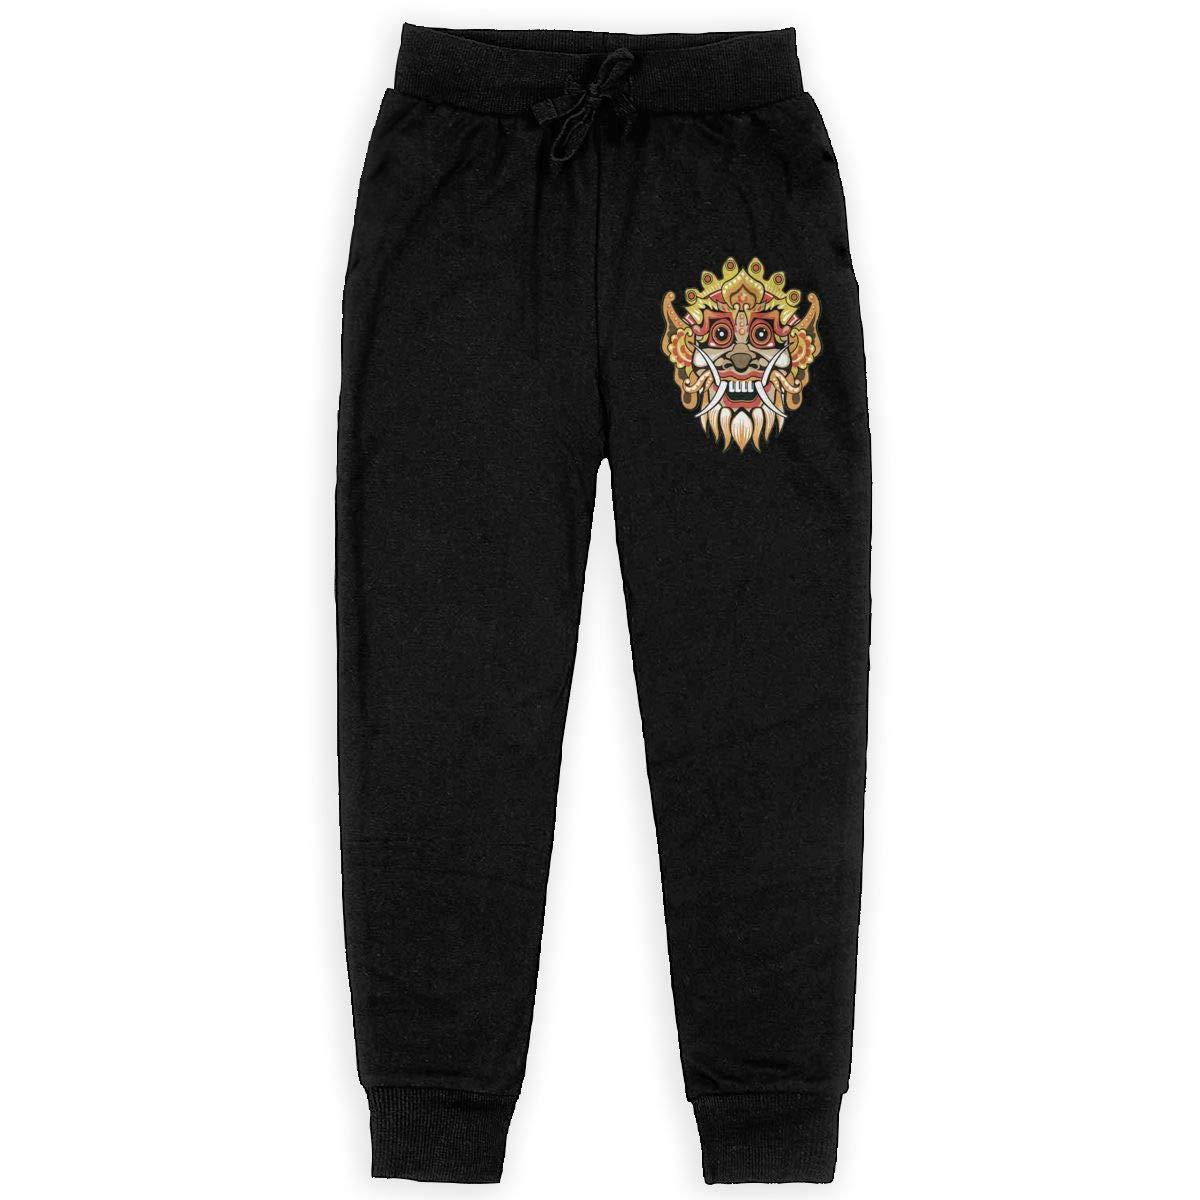 Dunpaiaa Cute Barong Boys Sweatpants,Joggers Sport Training Pants Trousers Black